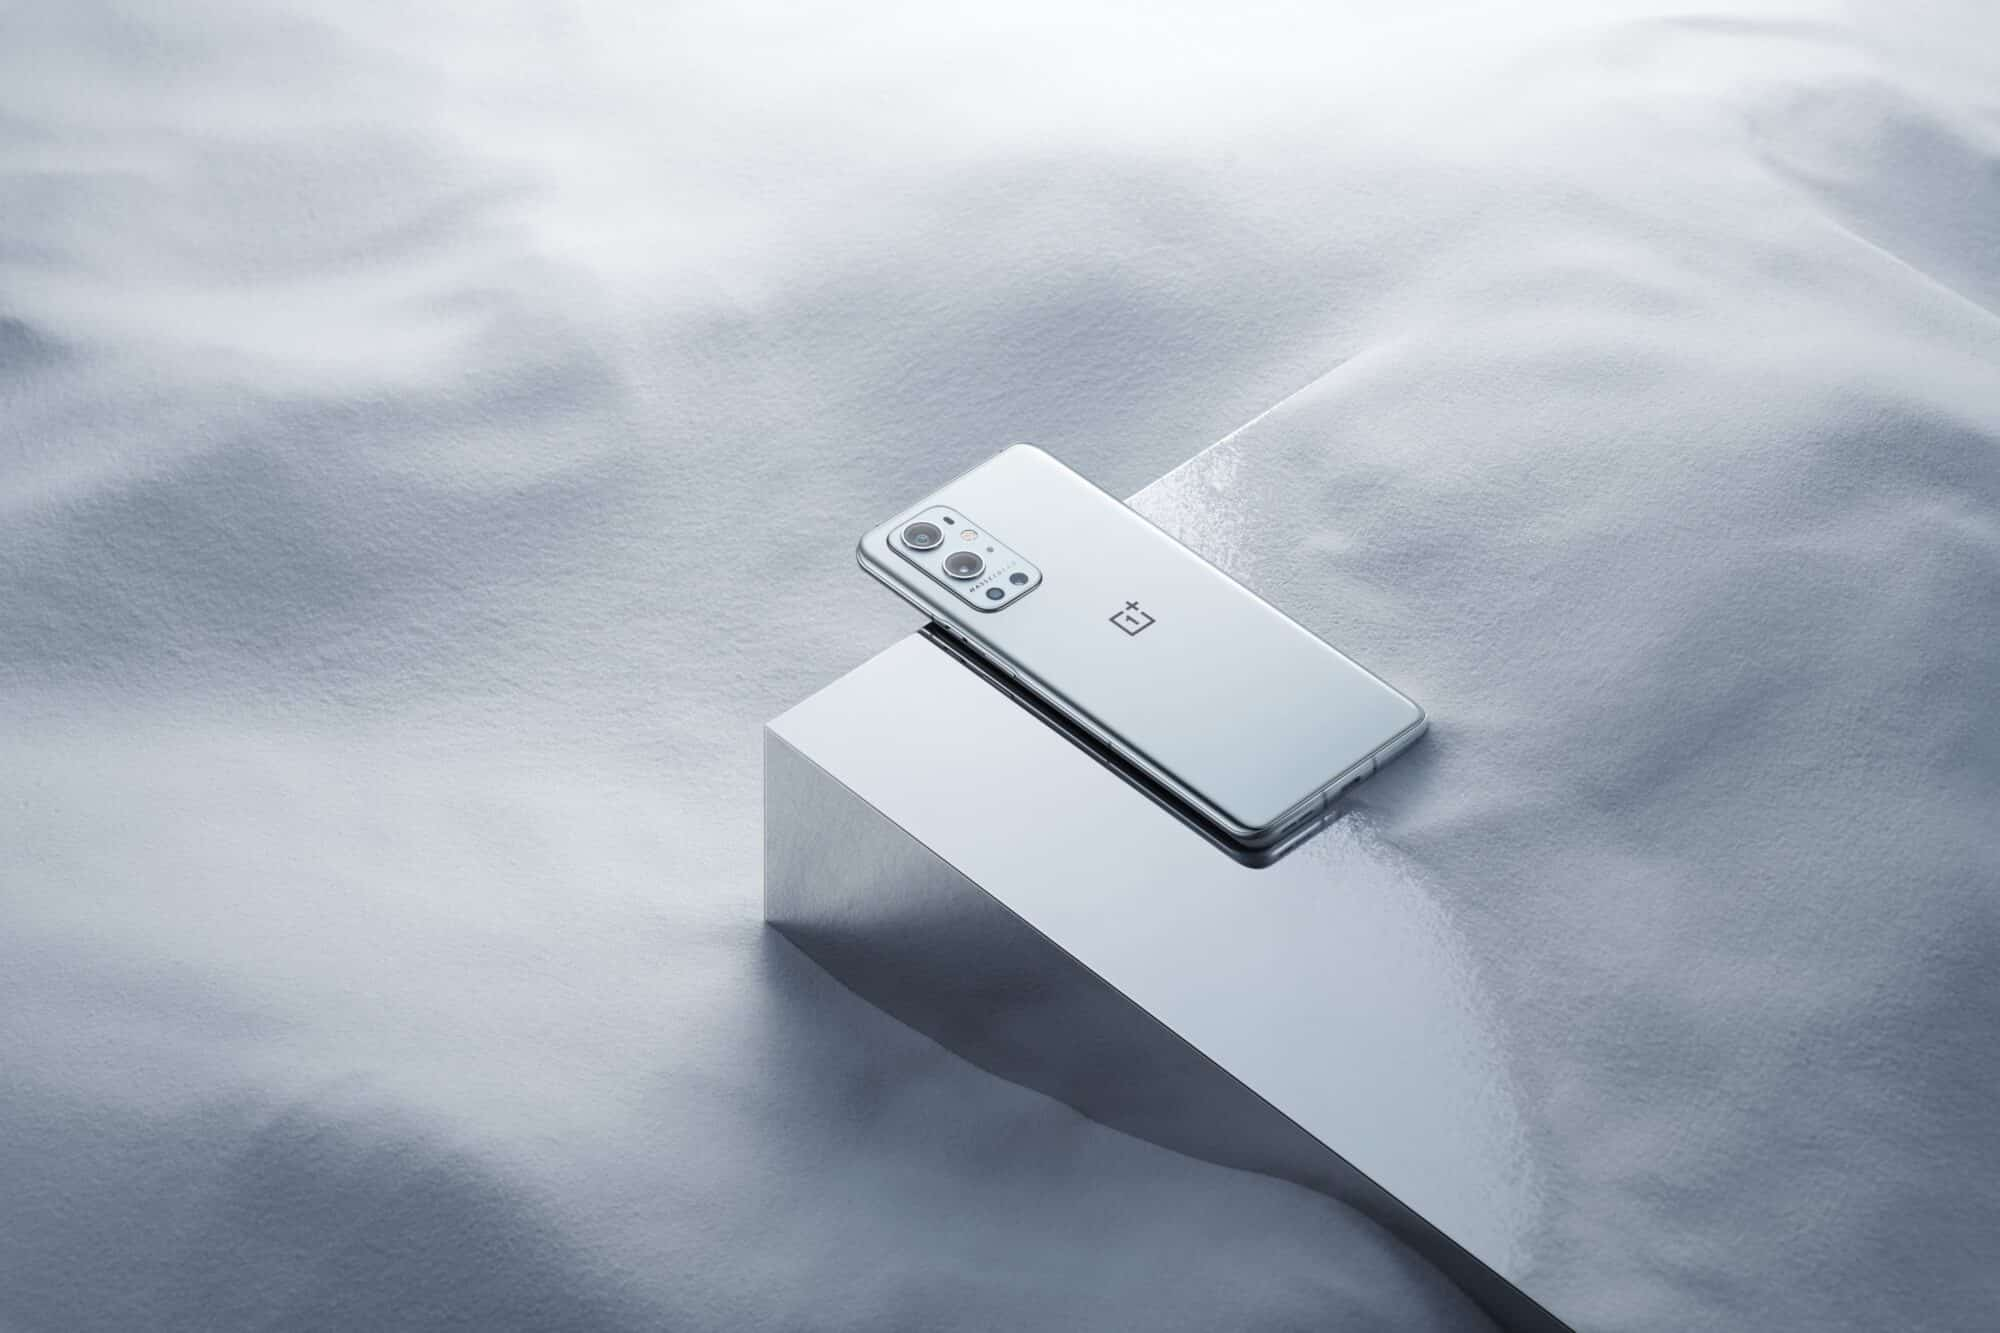 OnePlus-9-Pro-9R-smartphone